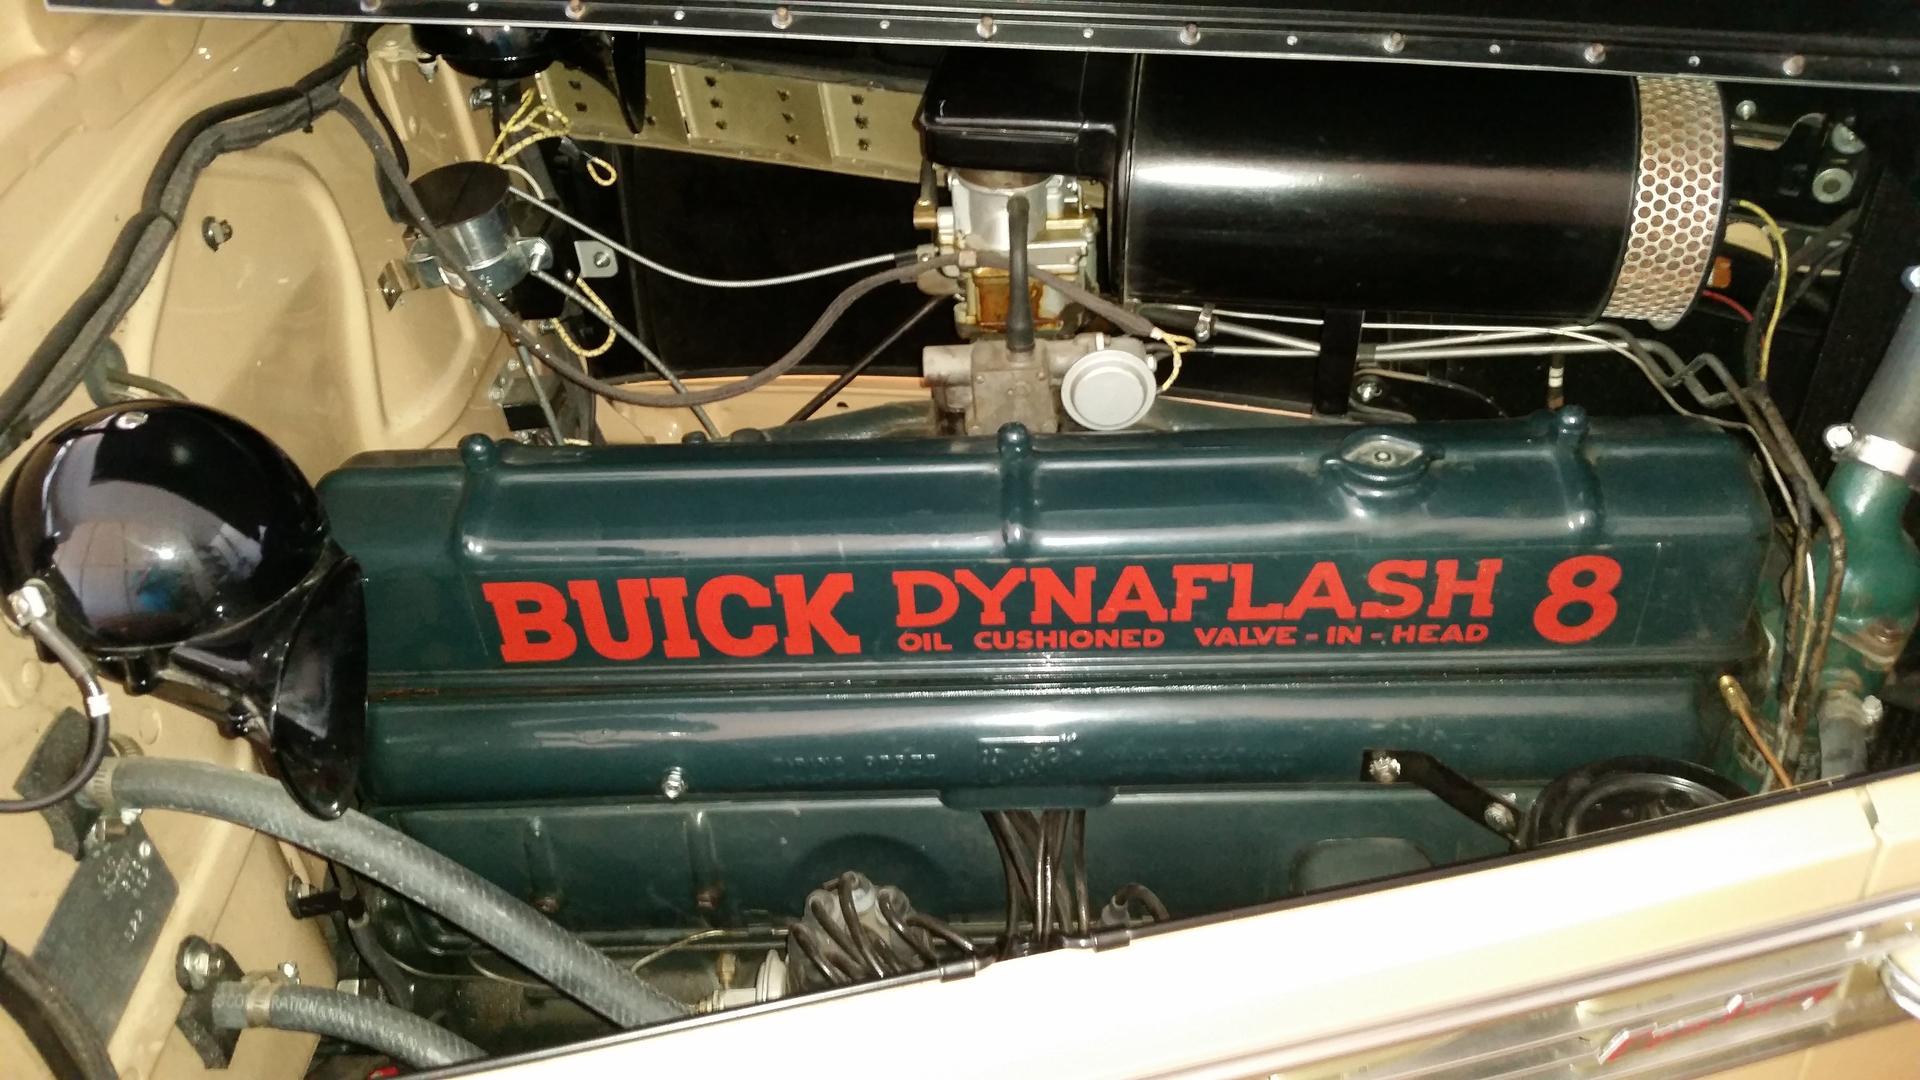 Advertisements Buick Engine Mounts Diagram Homemembershipcontact Usclub Officersbuick Historyphoto Gallerysavior Of Buicklinksadvertisements